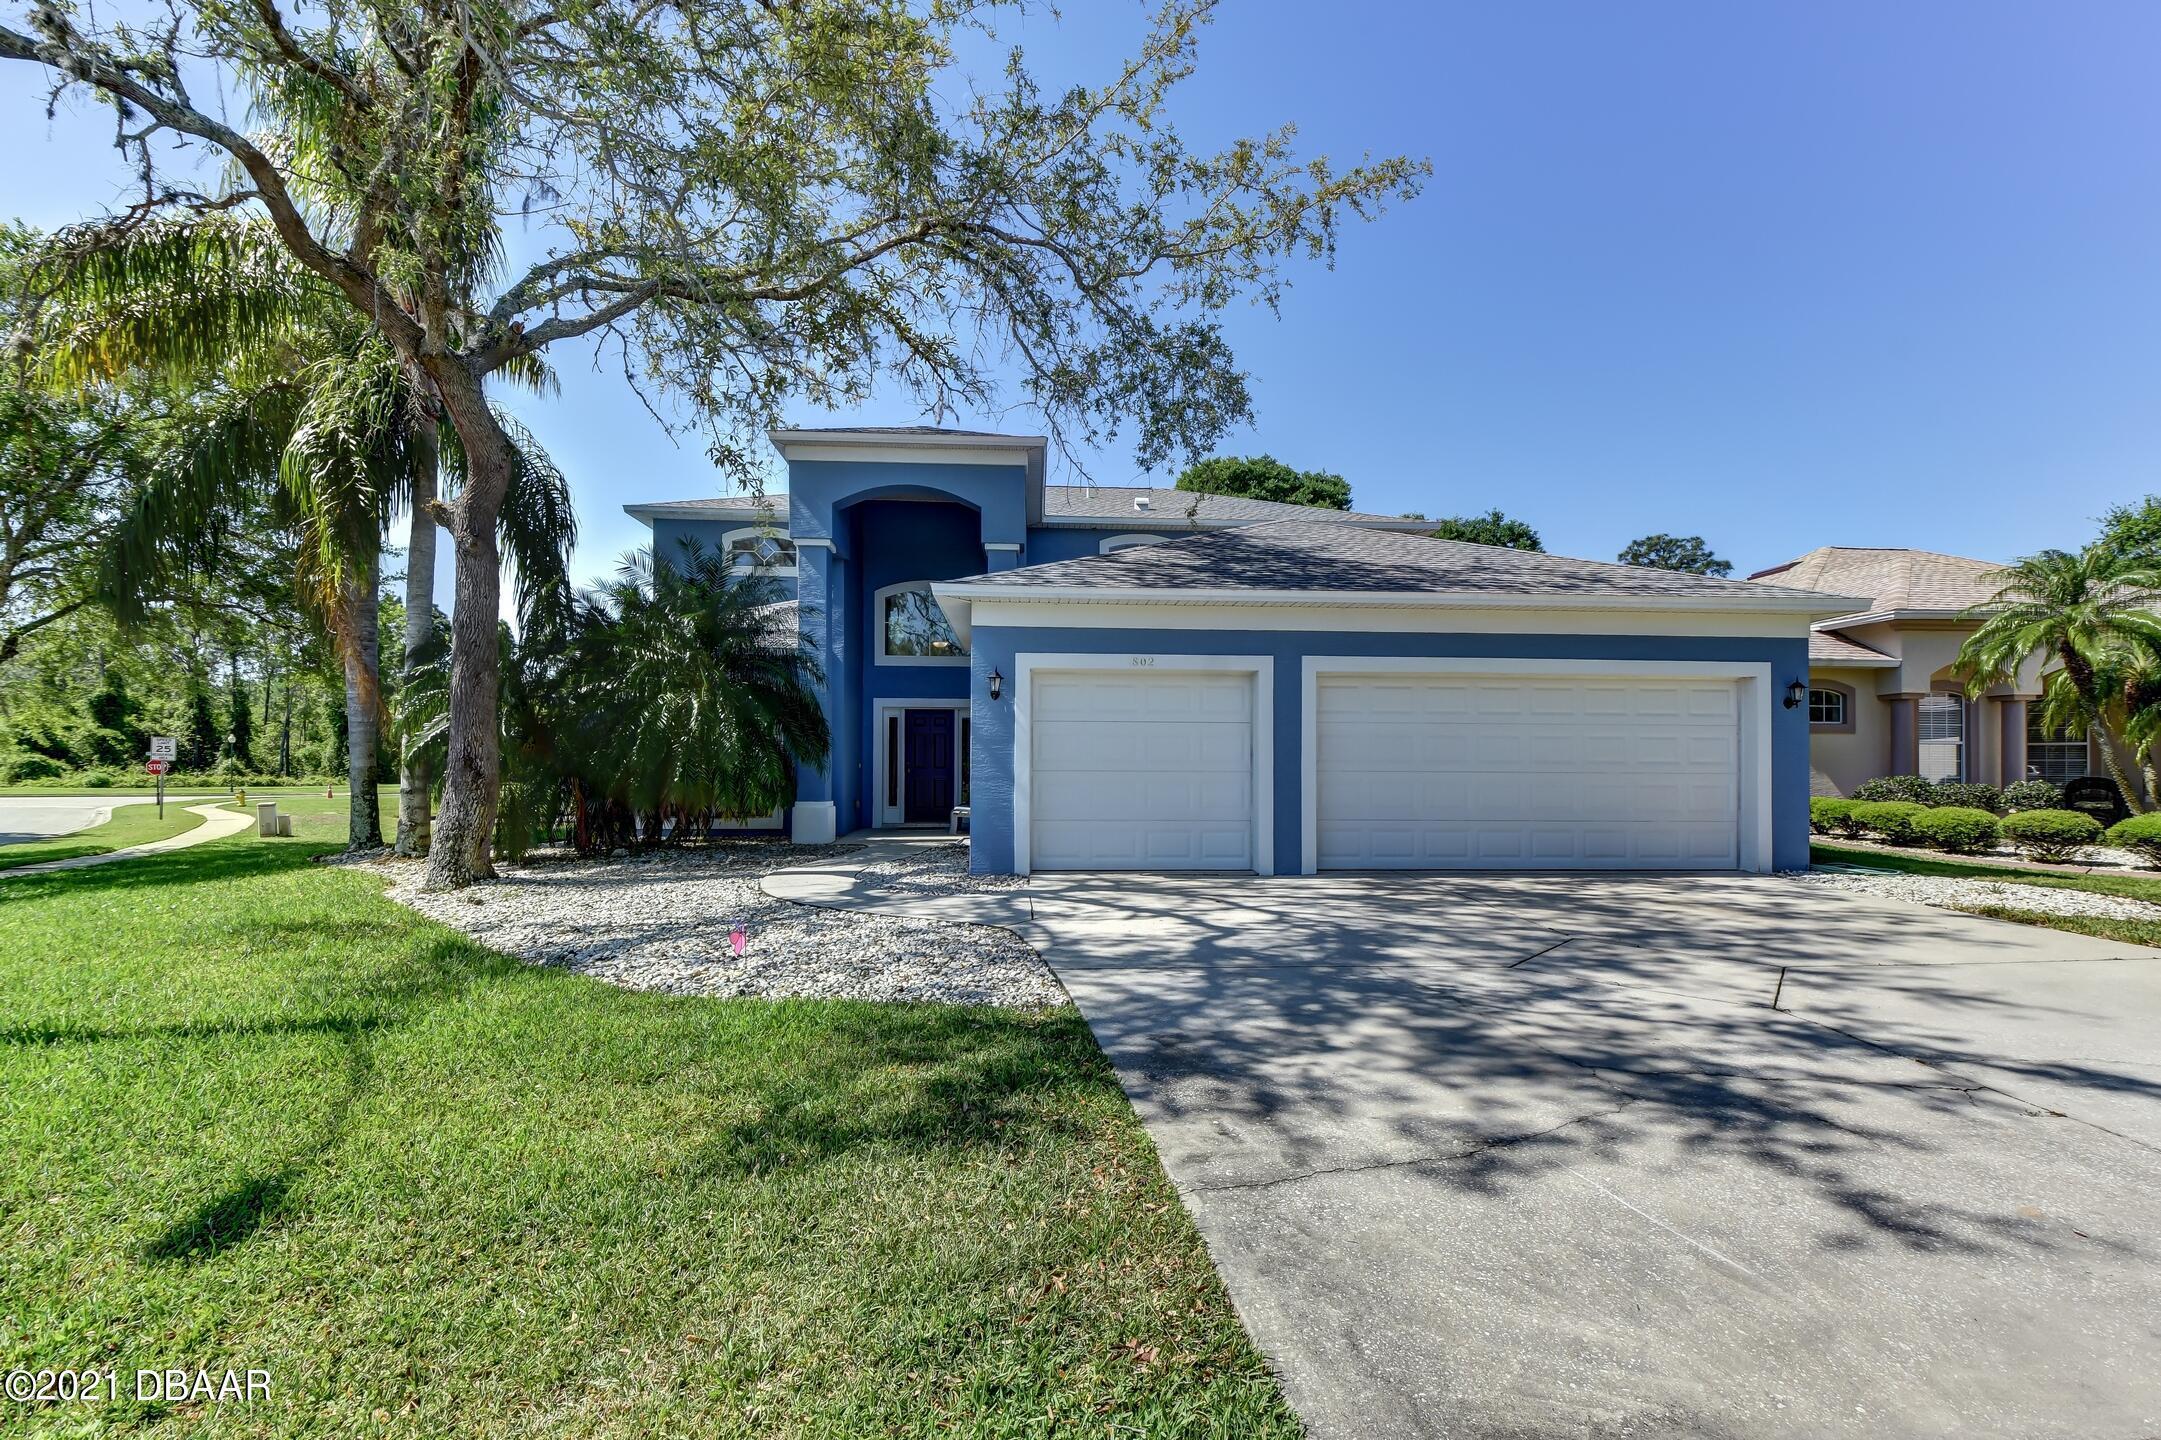 Photo of 802 Whispering Wind Court, Port Orange, FL 32128